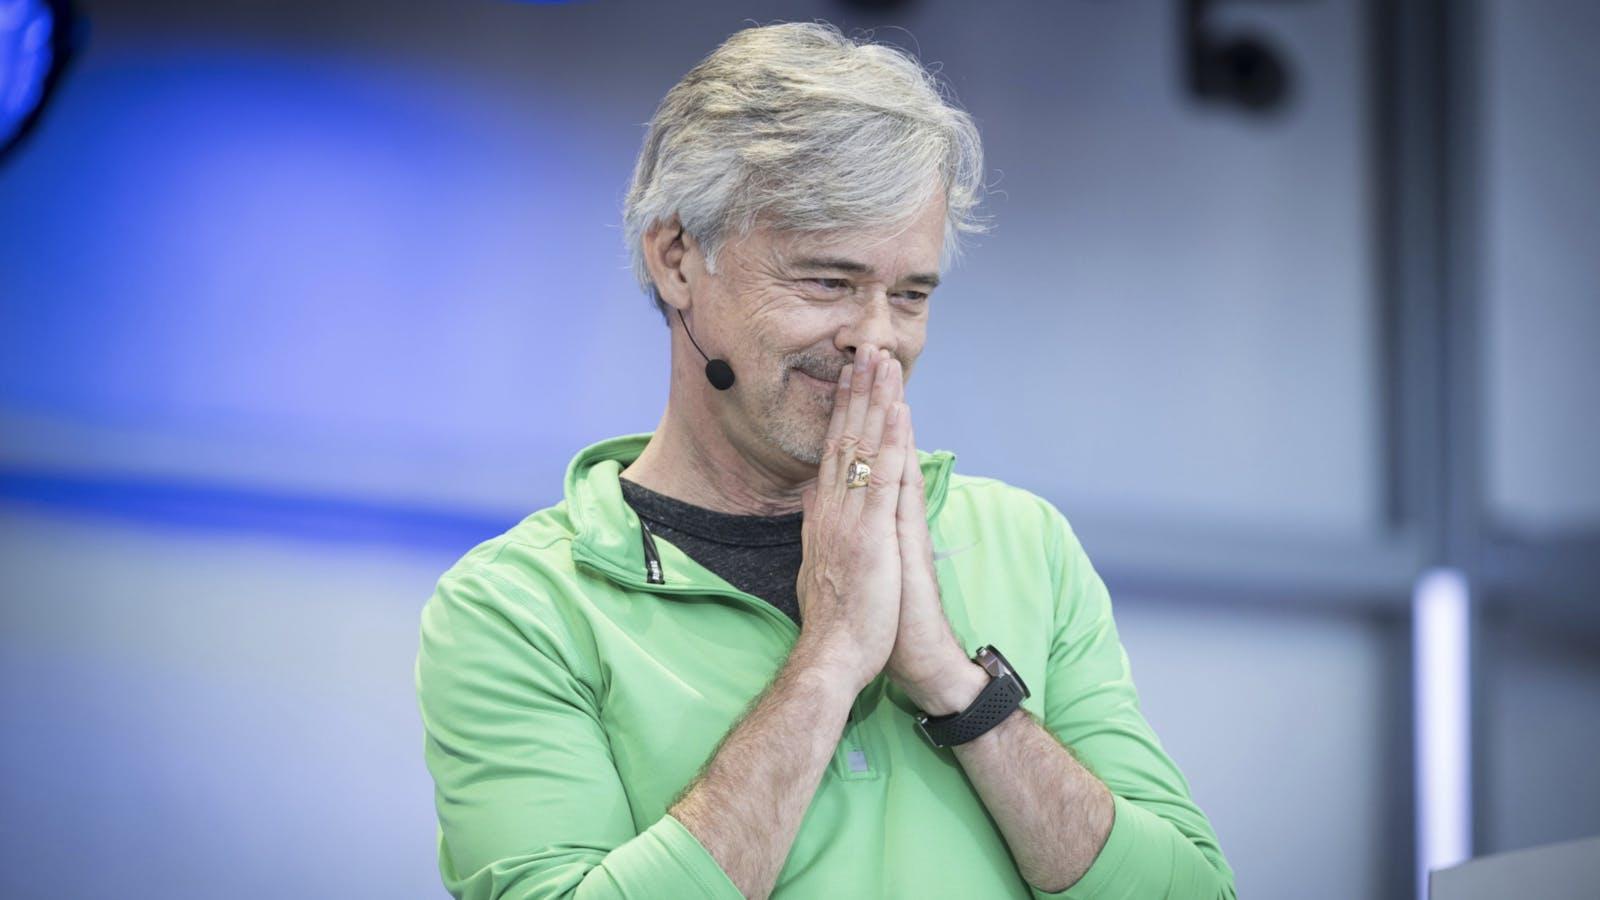 Waymo CEO John Krafcik. Photo by Bloomberg.